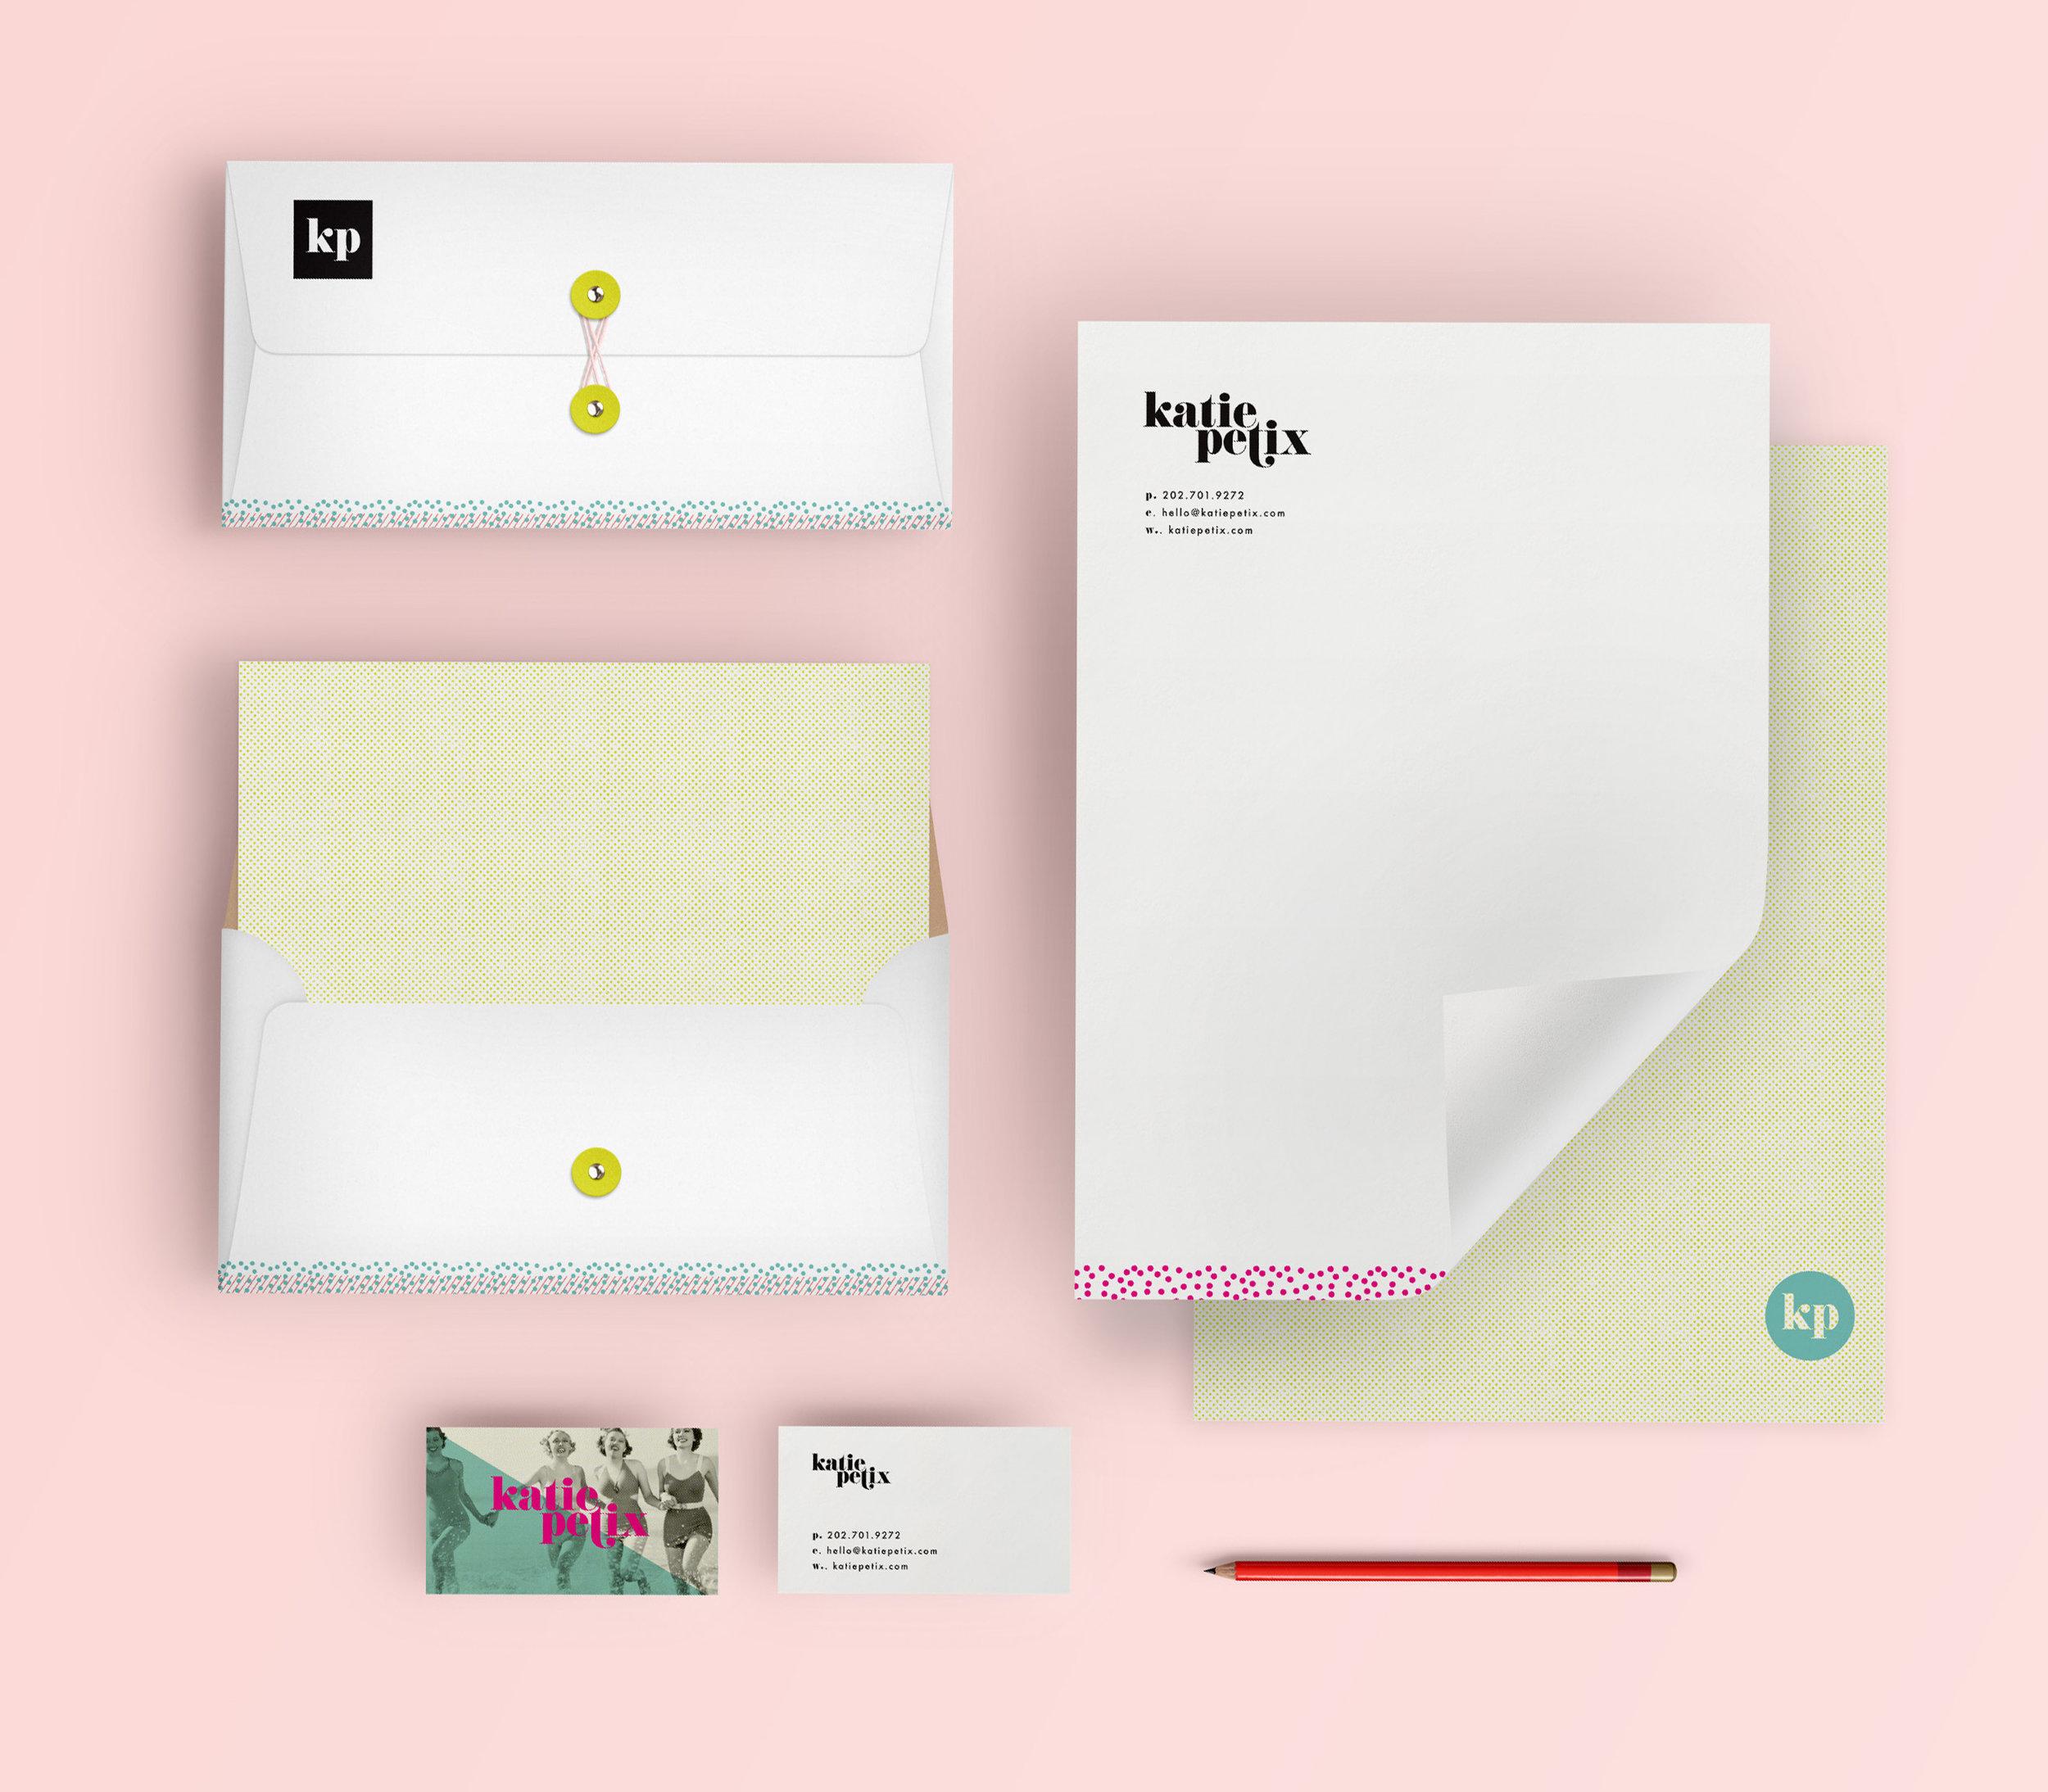 Katie-Petix-Social-Media-Manager-Branding-Stationery-Letterhead copy.jpg